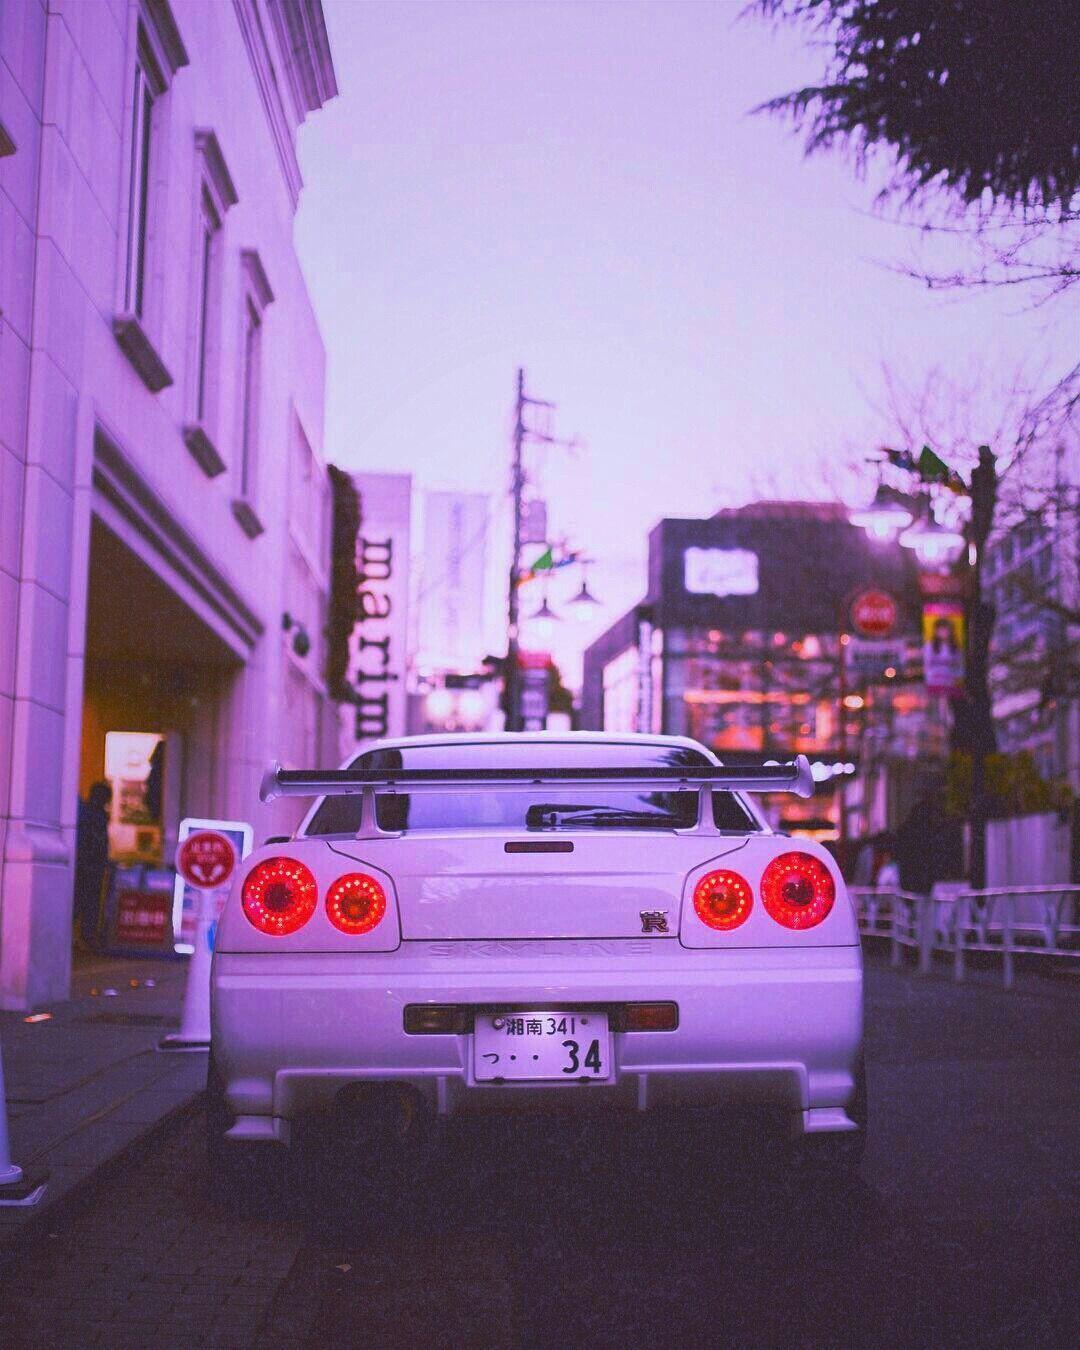 Edc graphics, toyota supra, jdm, japanese cars, motor vehicle. Aesthetic Japanese Car Wallpapers - Wallpaper Cave